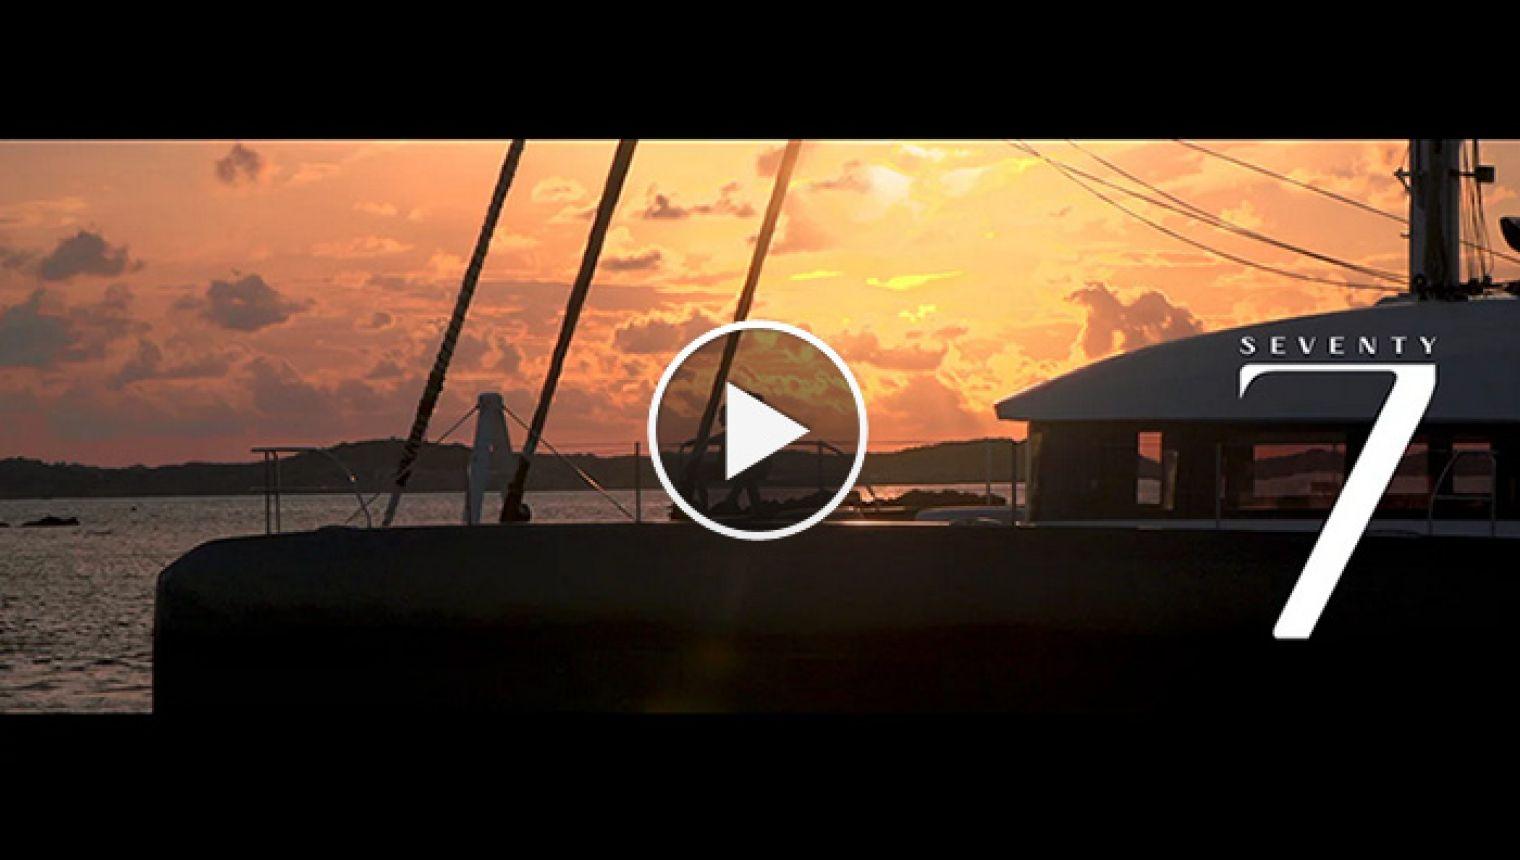 SEVENTY 7's video now online!